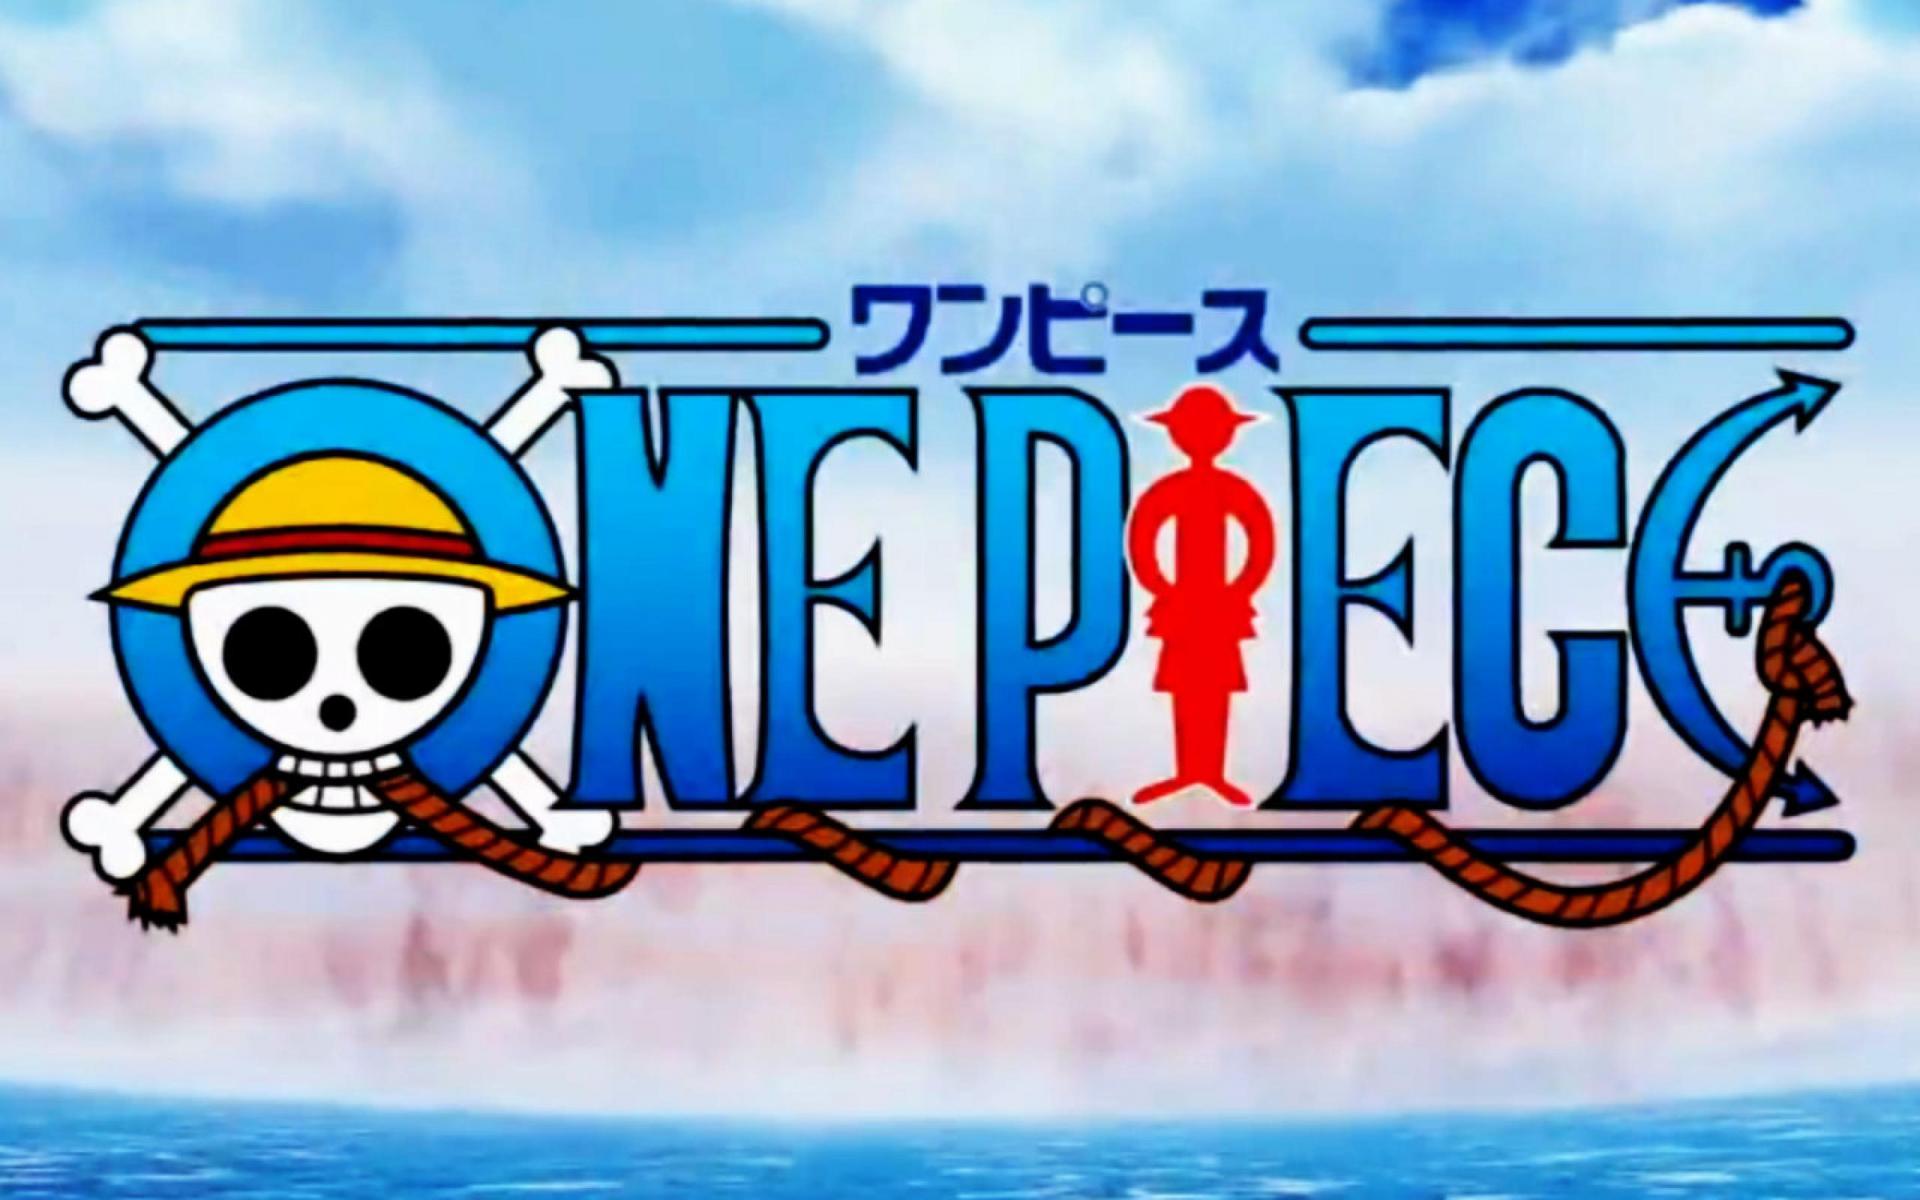 One Piece 壁紙 4332 Hd Wallpaper